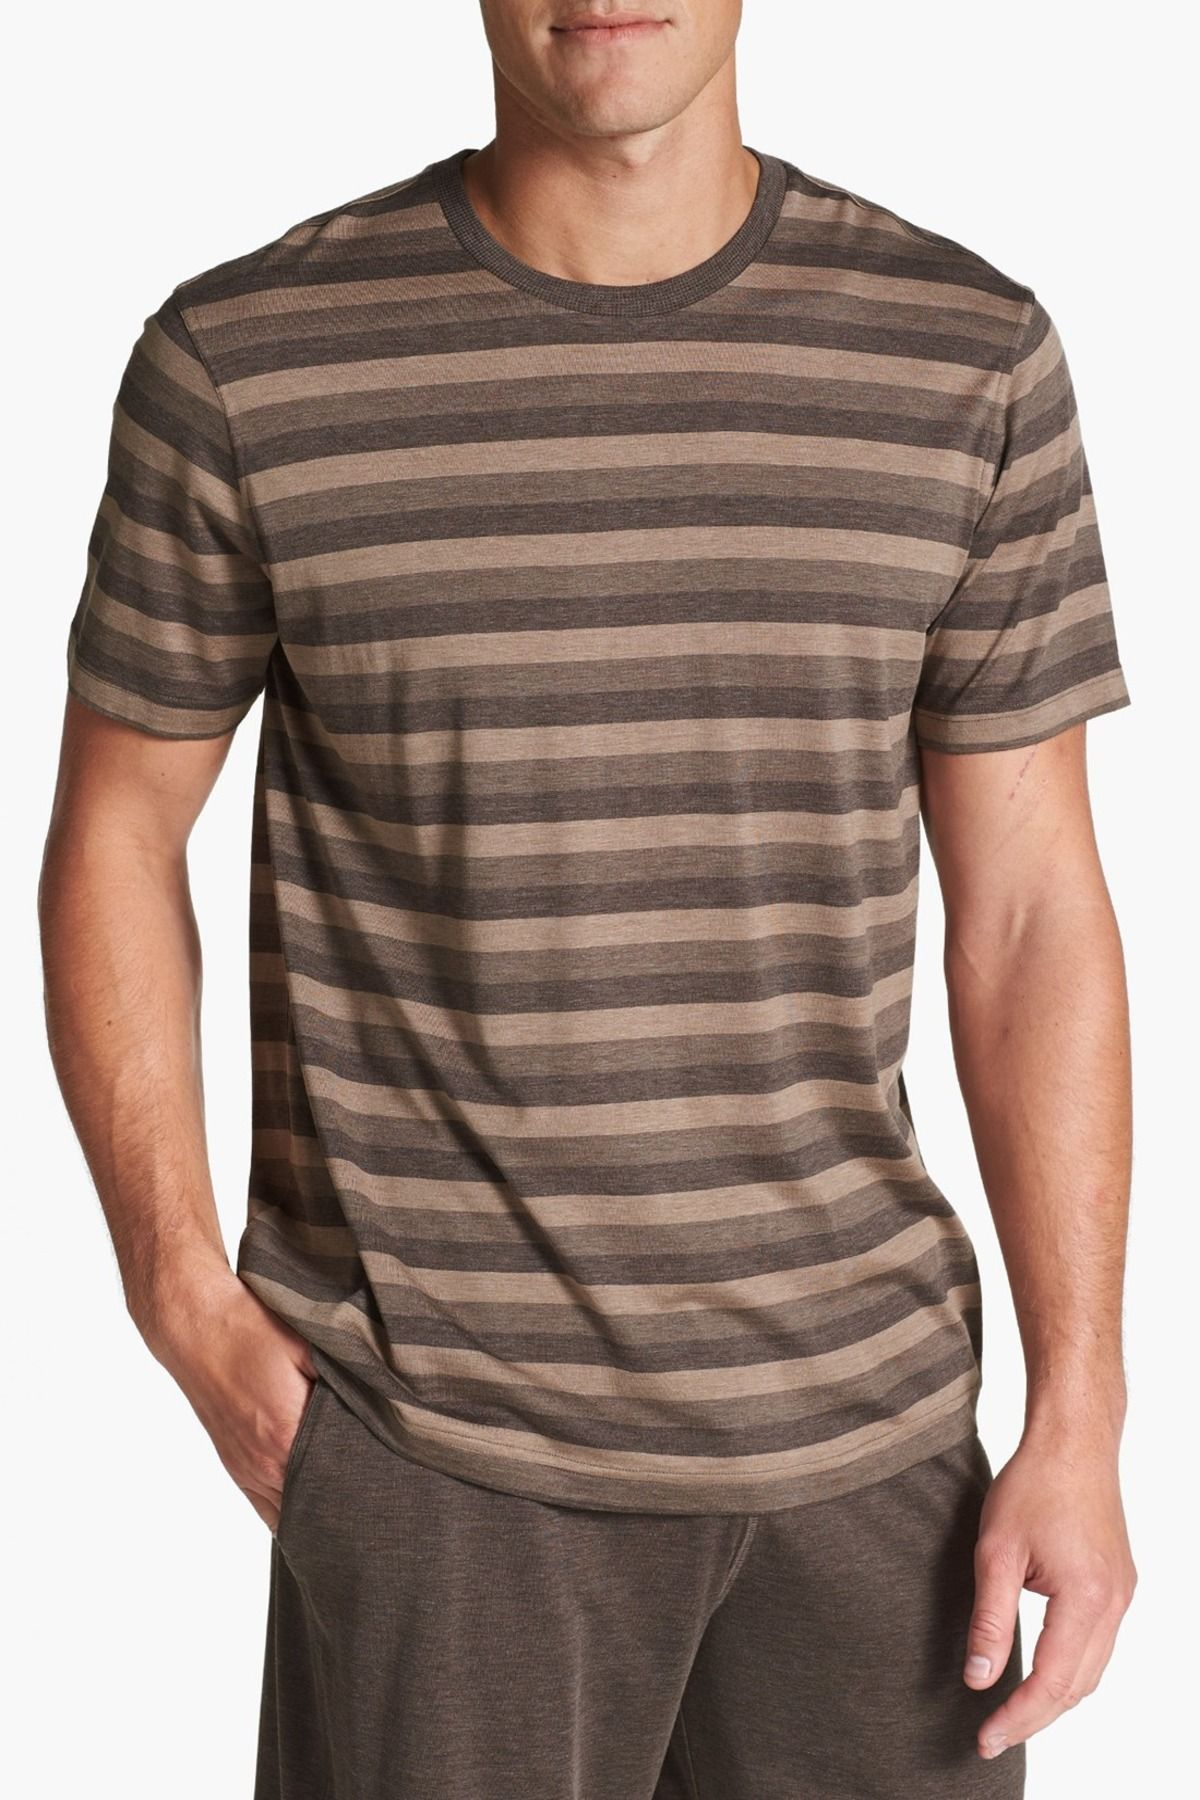 Daniel Buchler | Daniel Buchler Silk & Cotton Crewneck T-Shirt | Nordstrom Rack